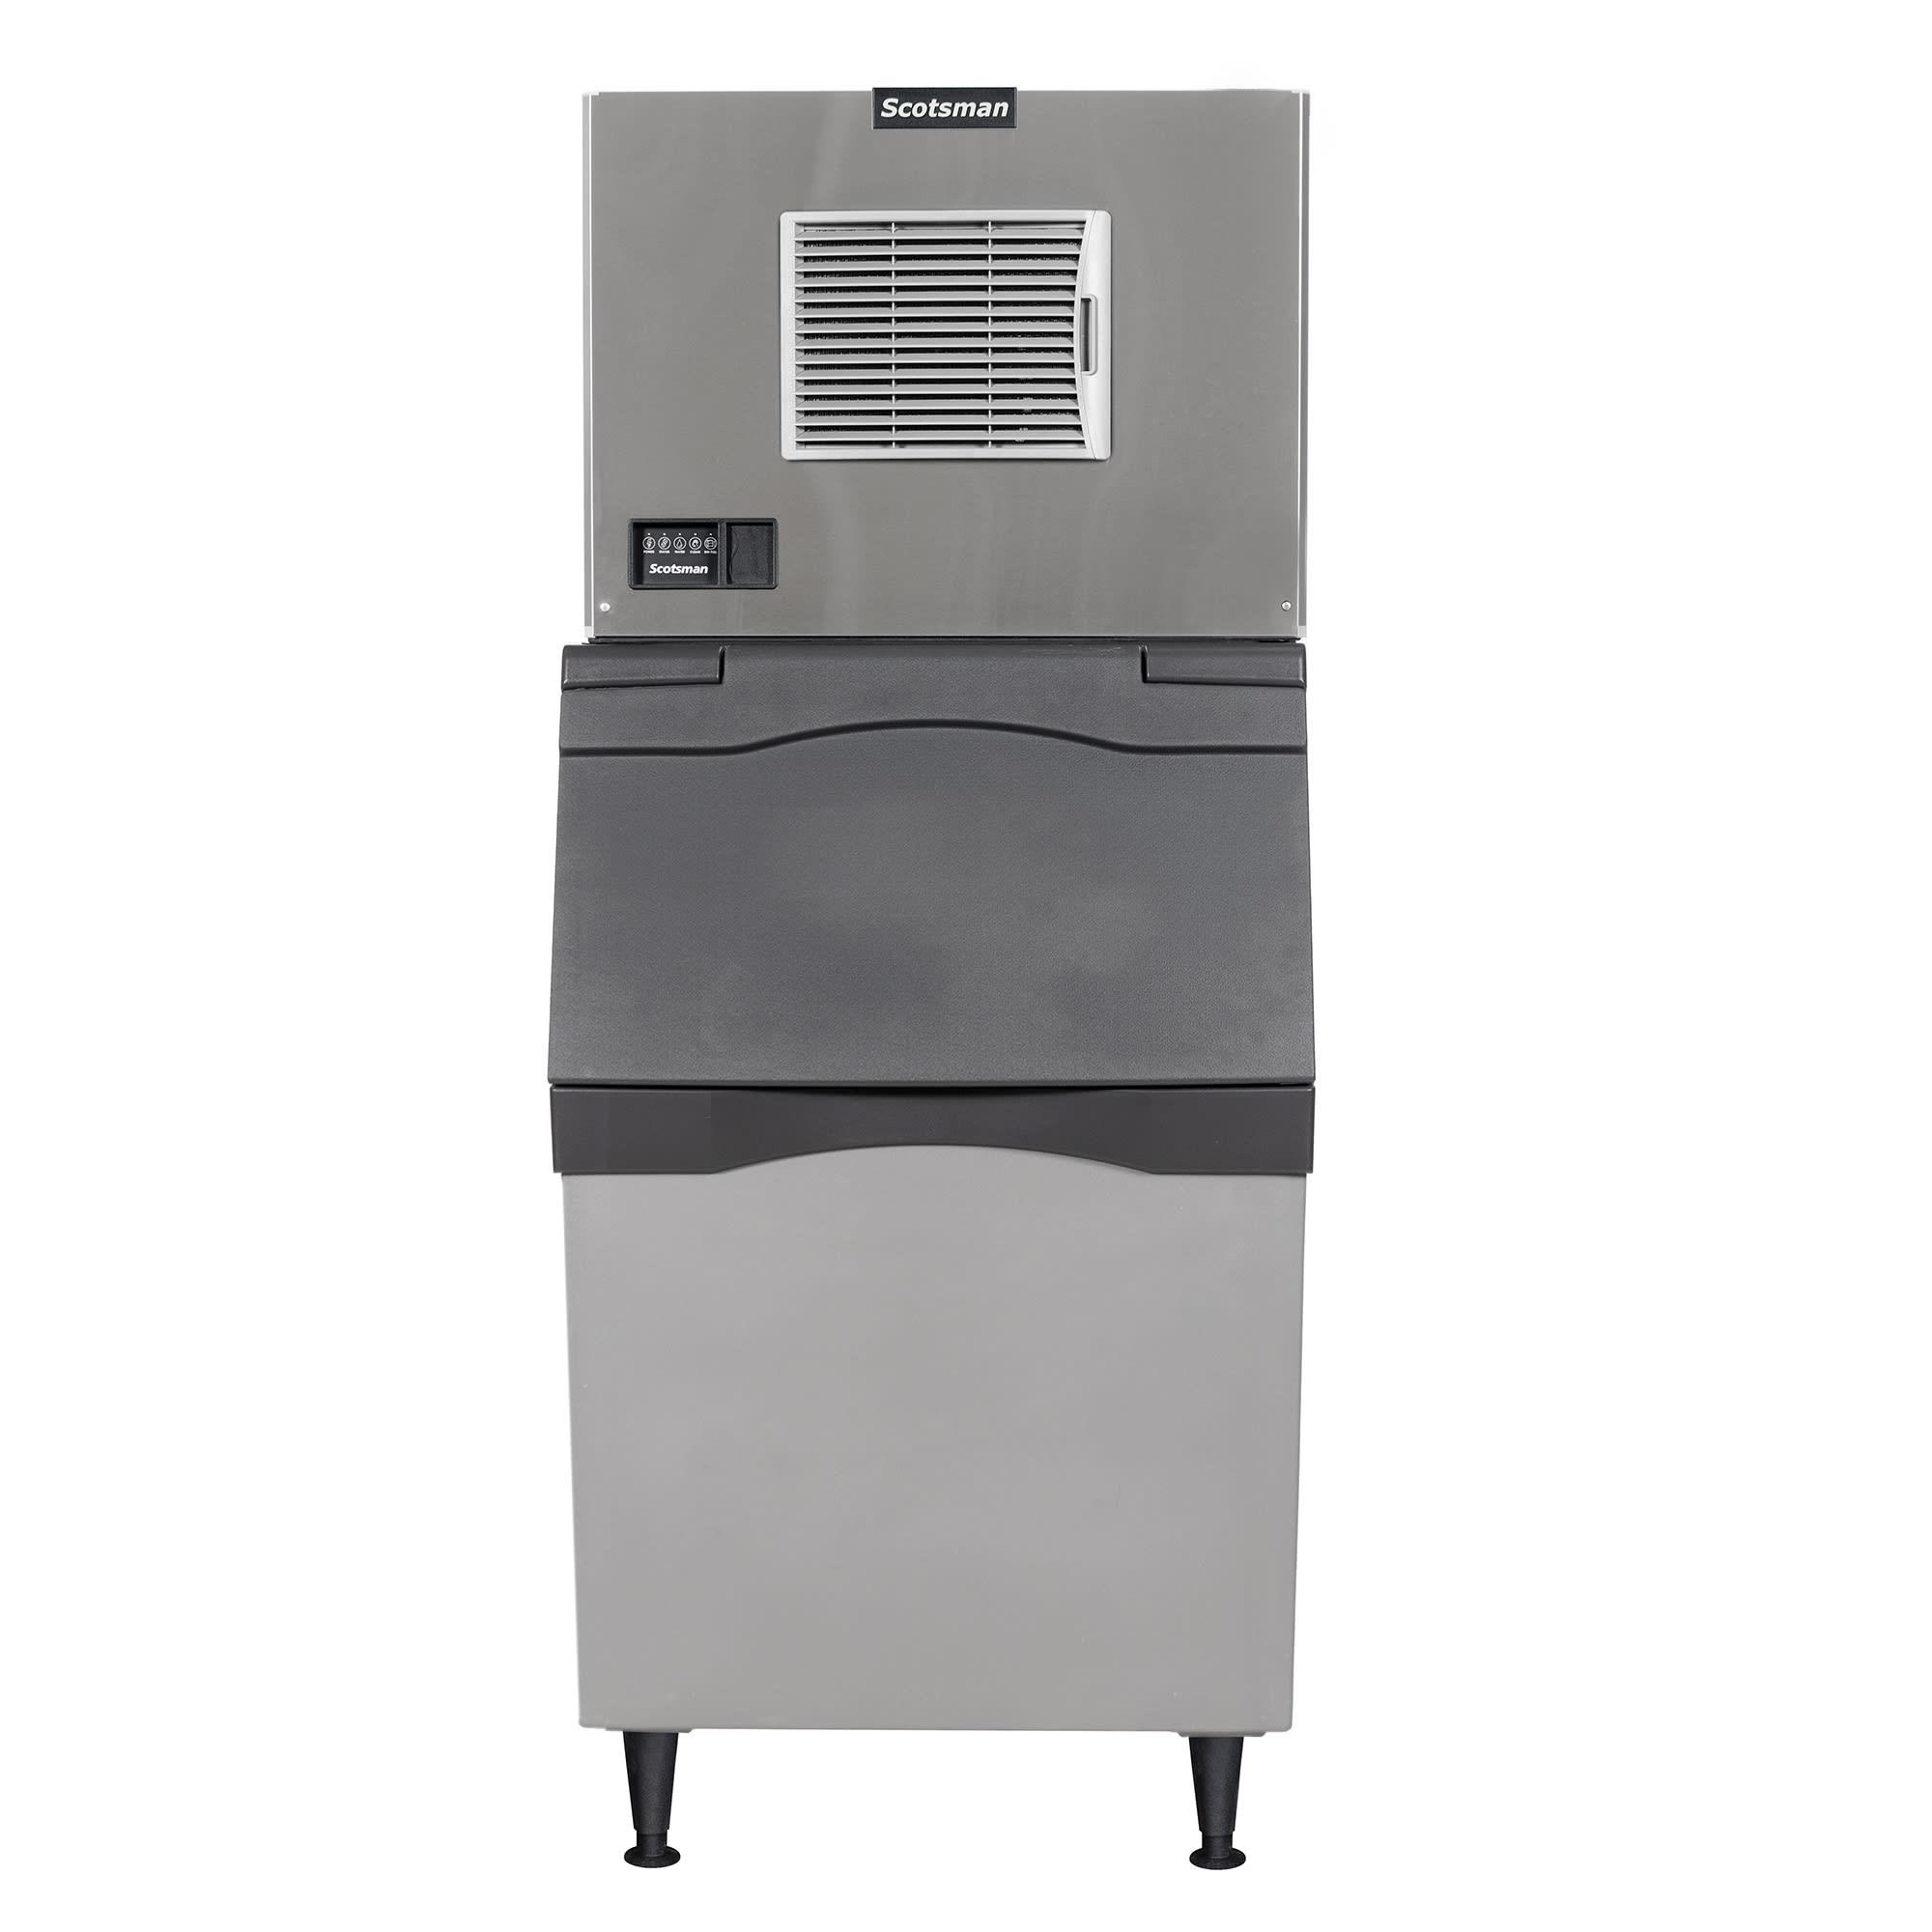 Scotsman C0630SA32AB530P 776-lb/Day Prodigy Half Cube Ice Maker w/ 420-lb Bin, Air Cooled, 208v/1ph